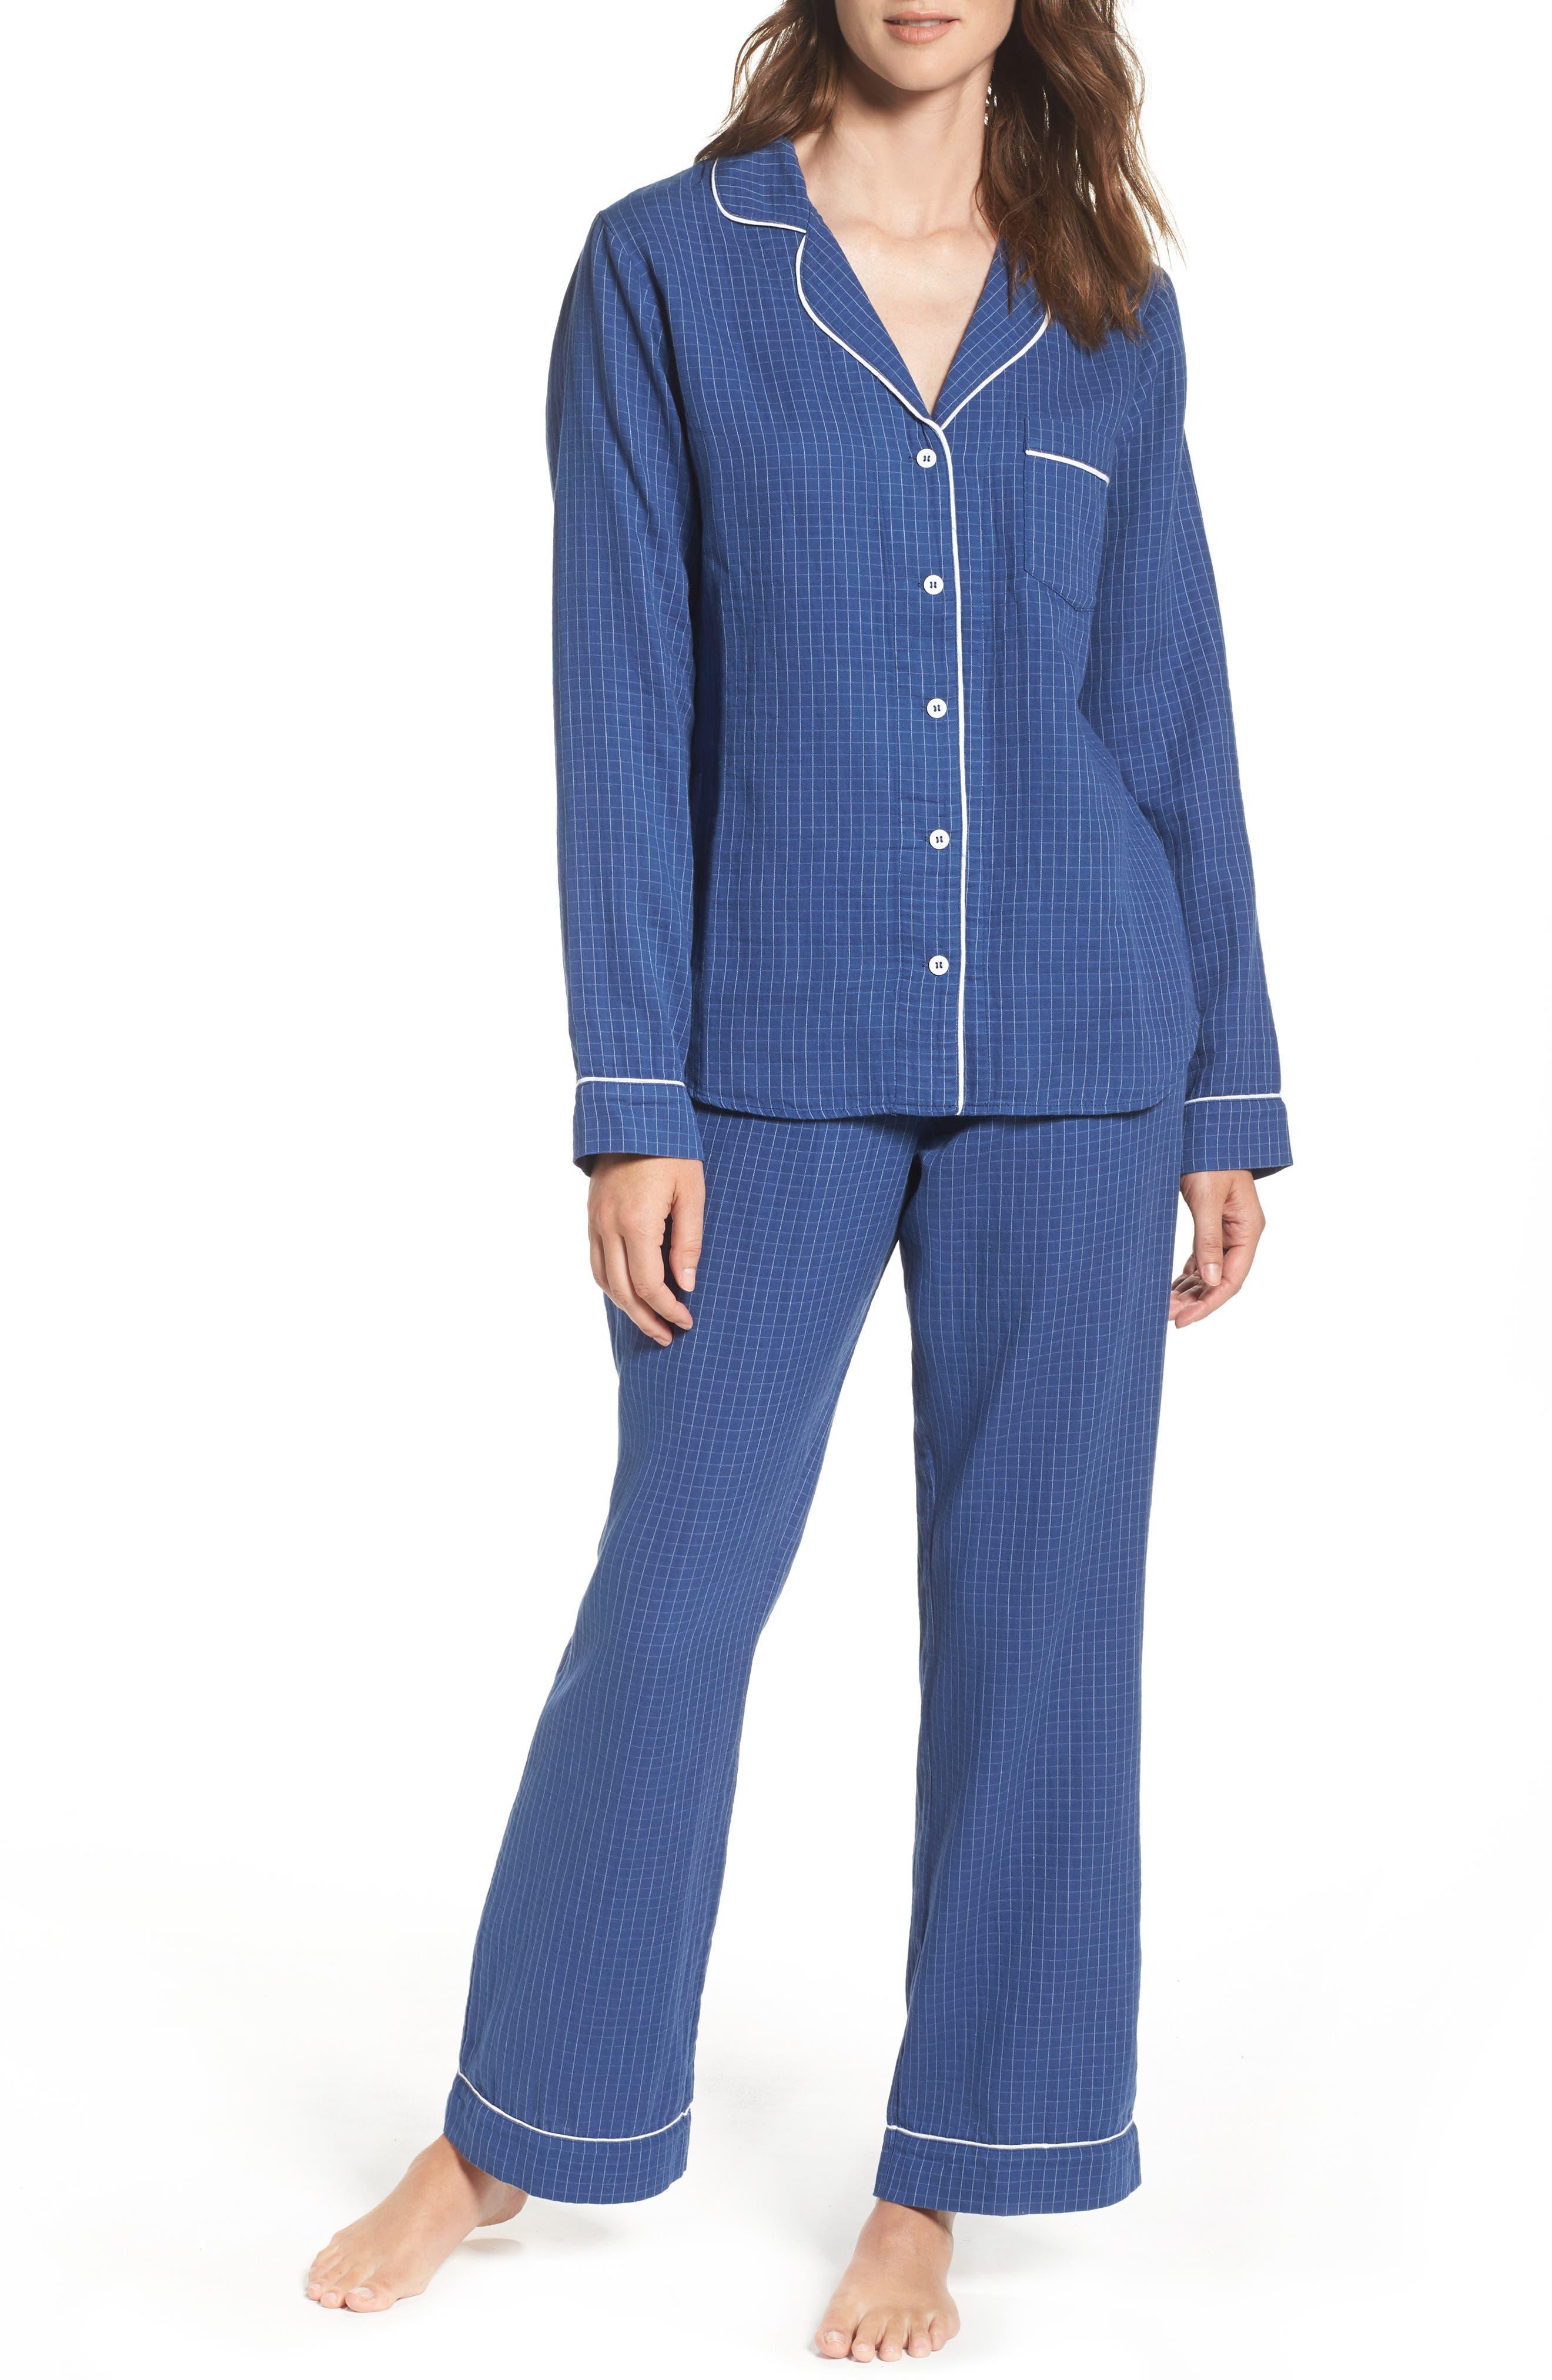 Raven Check Pajamas,                         Main,                         color, 400